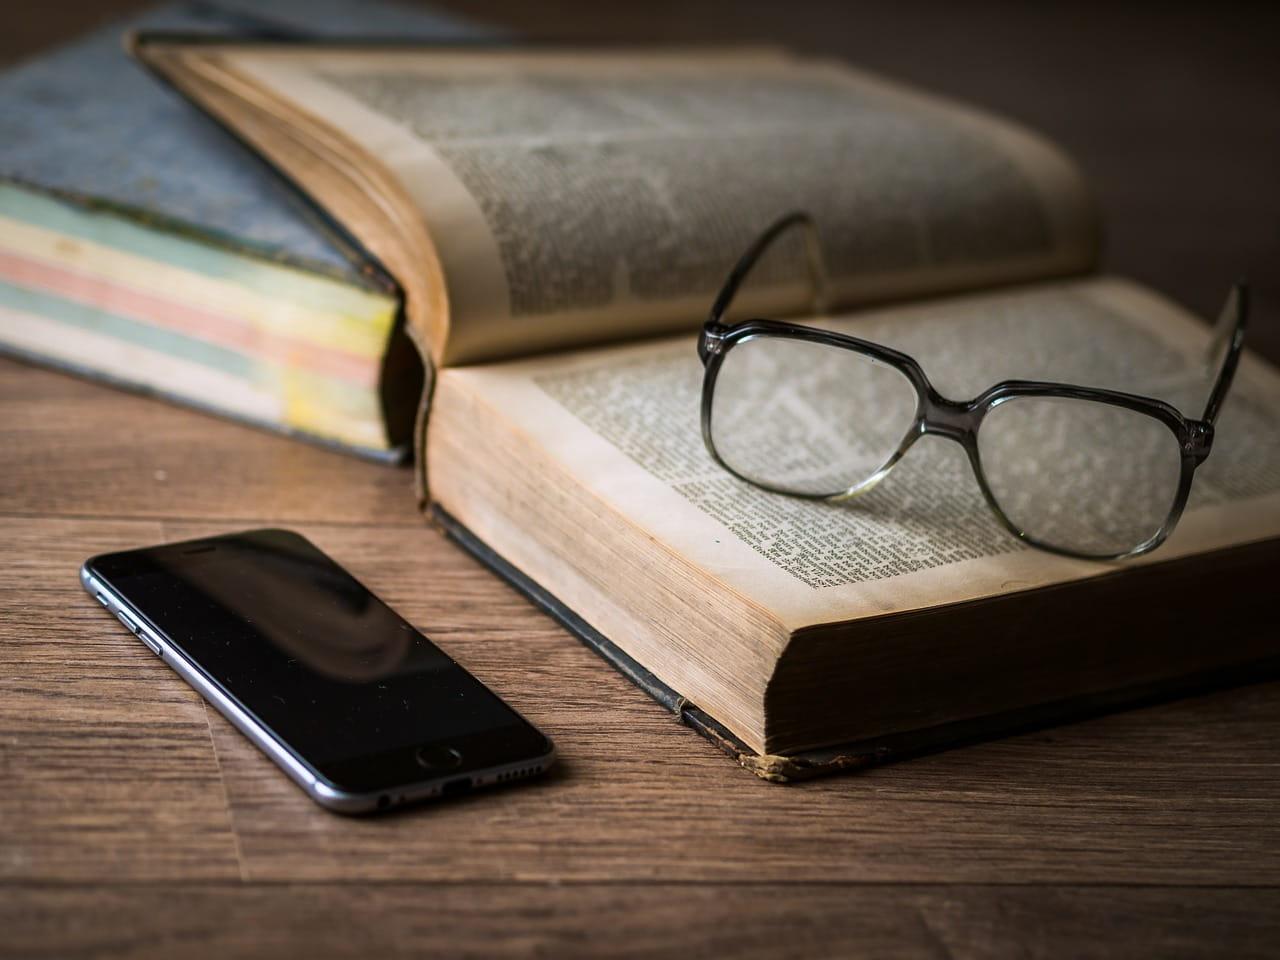 Best 78+ Informative Essay Topics 2021